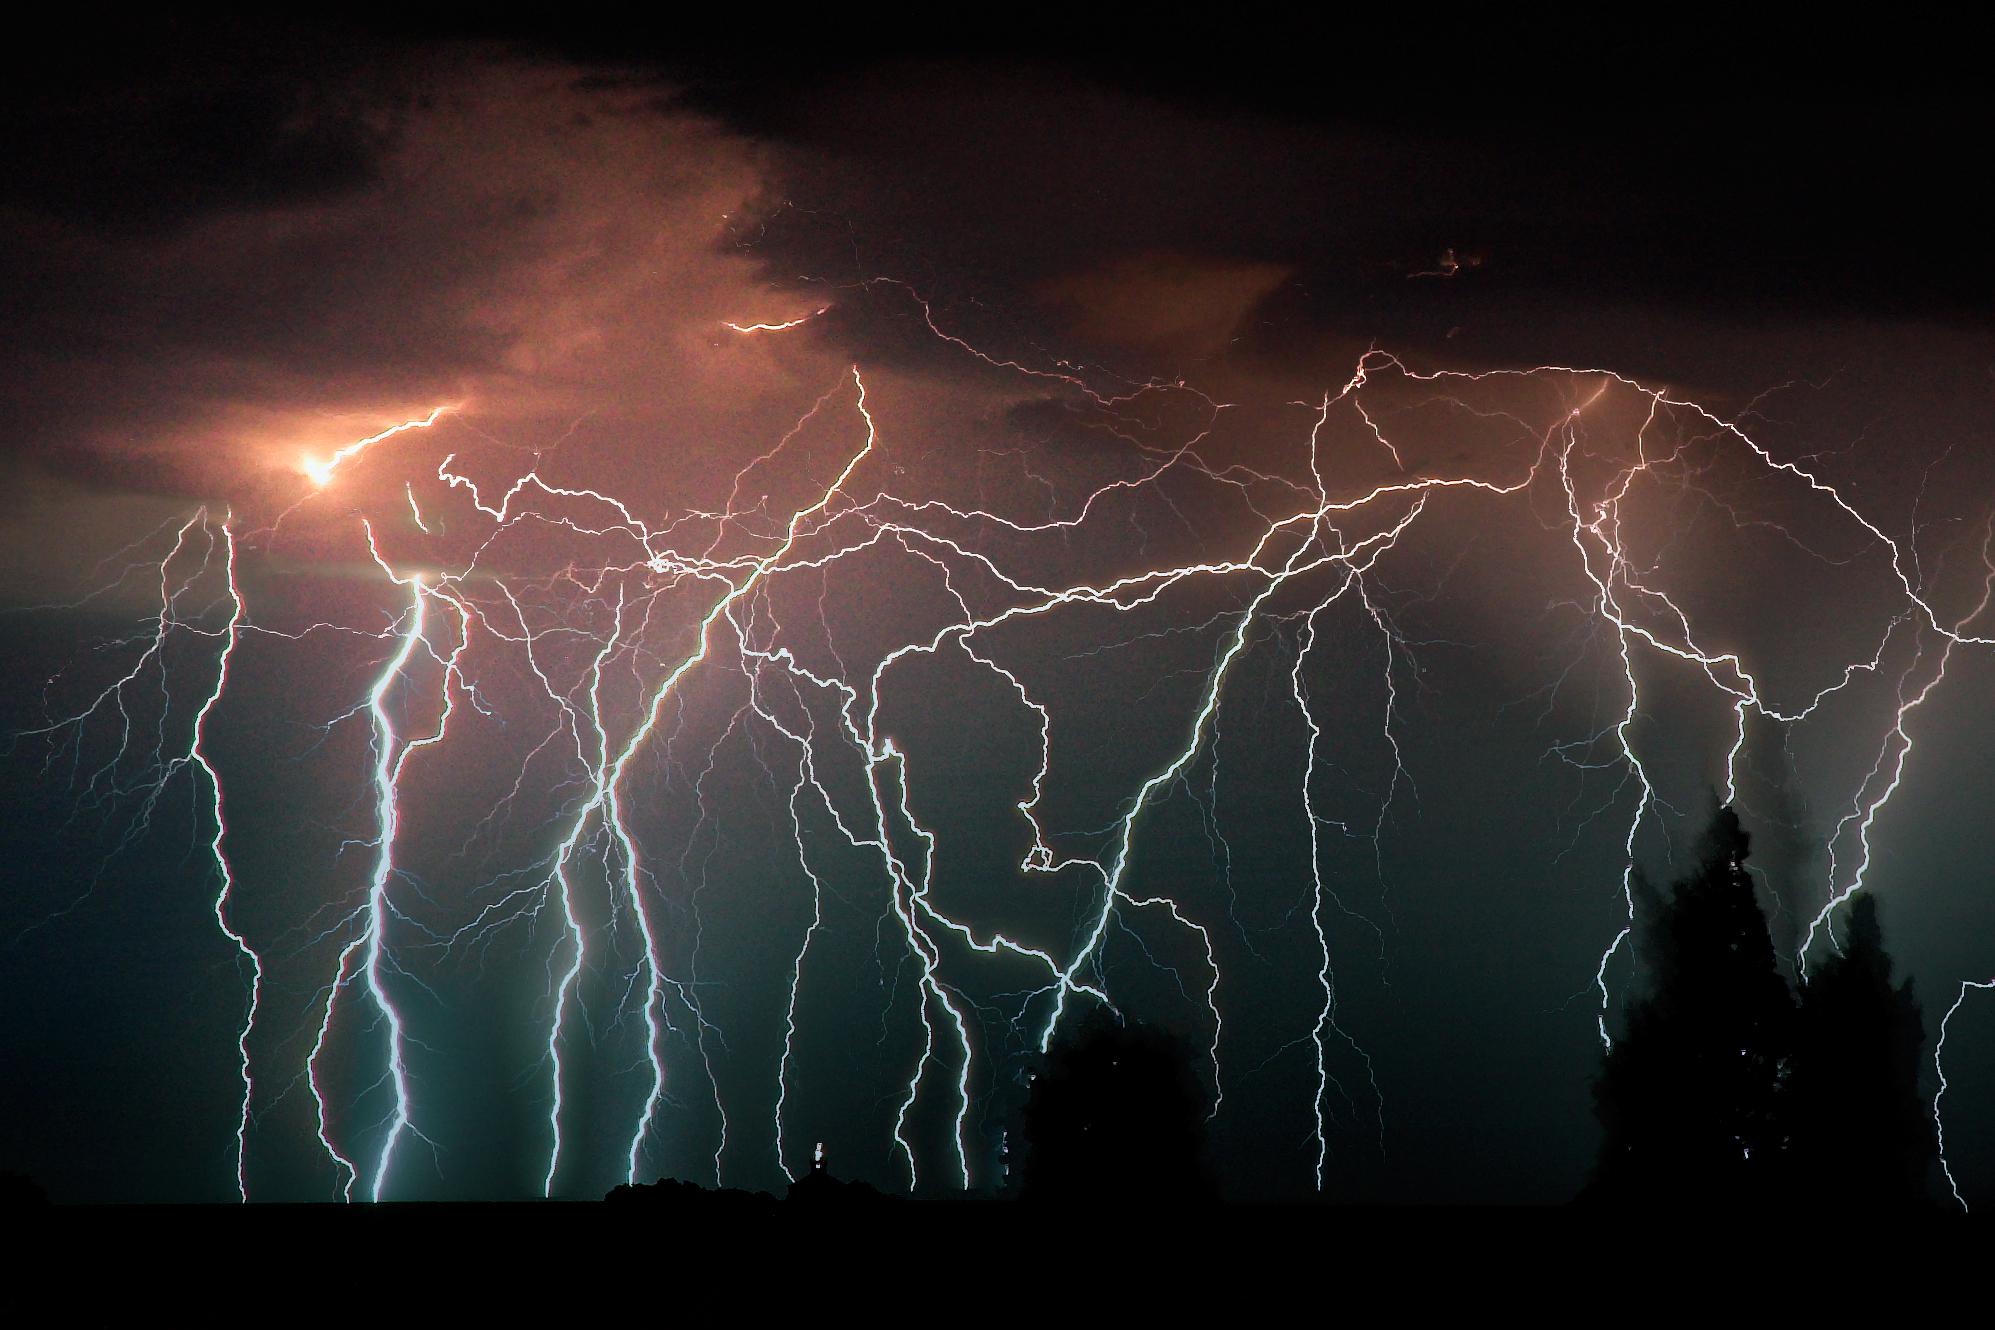 lightning hd wallpaper color palette tags storm weather lightning 1995x1330